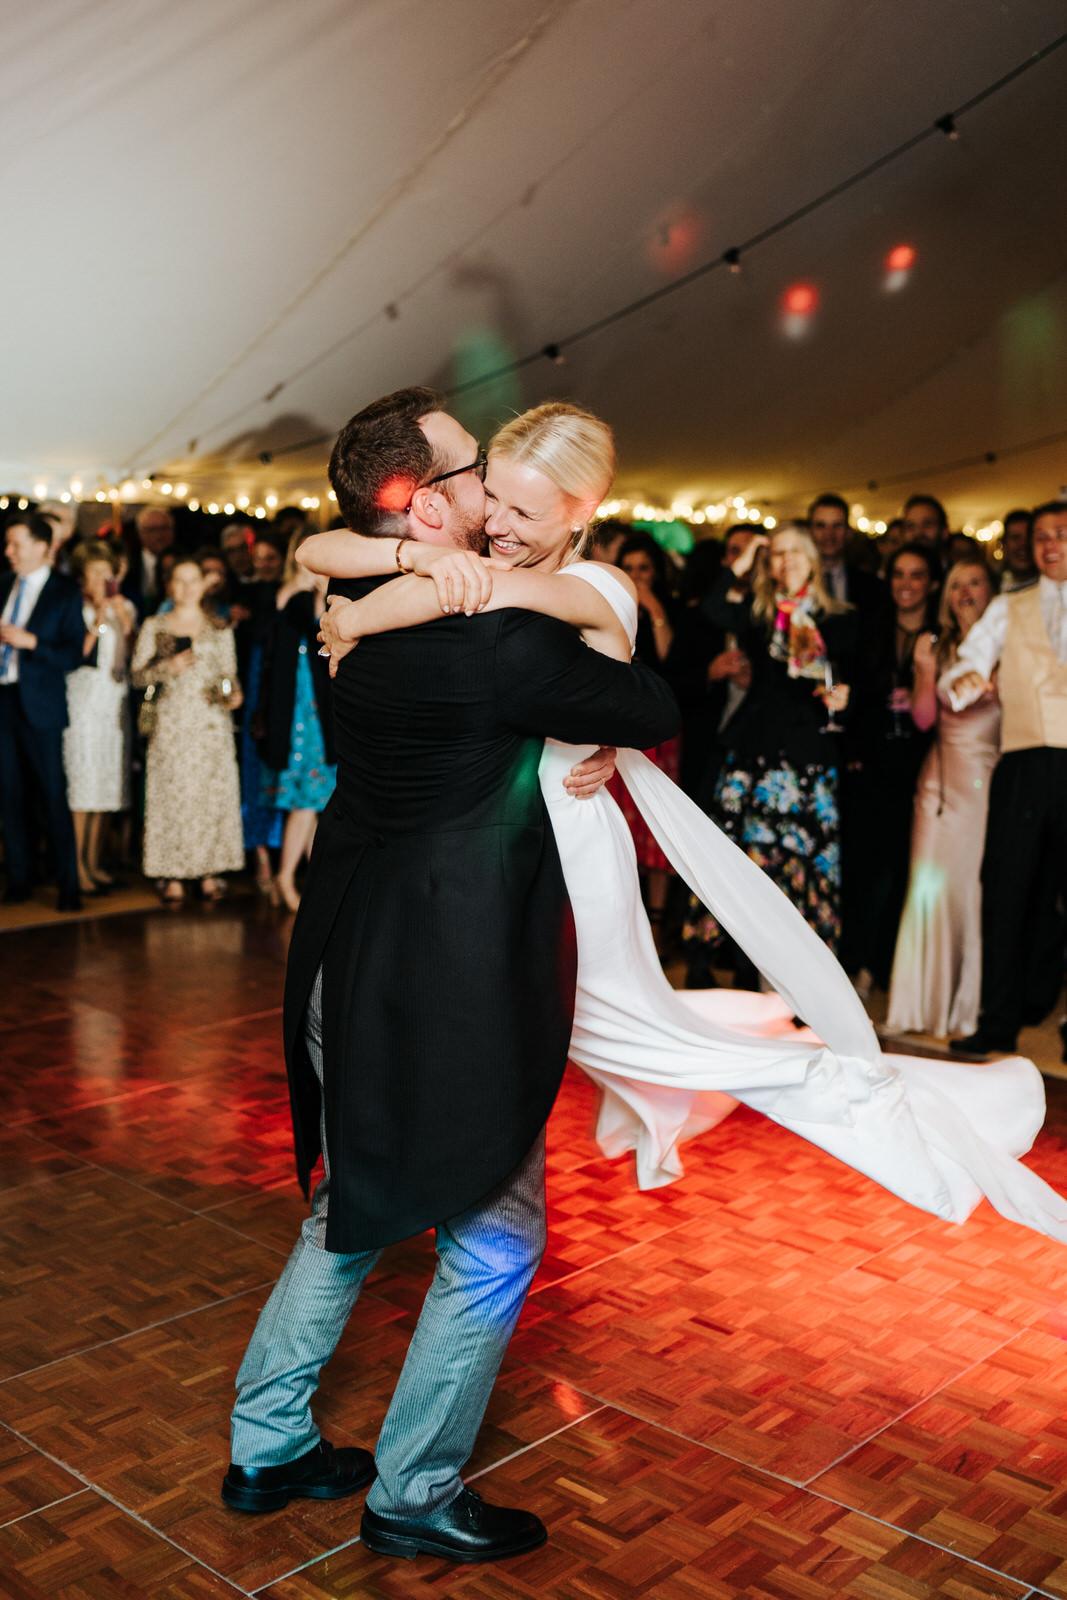 Grooom picks up bride during first dance